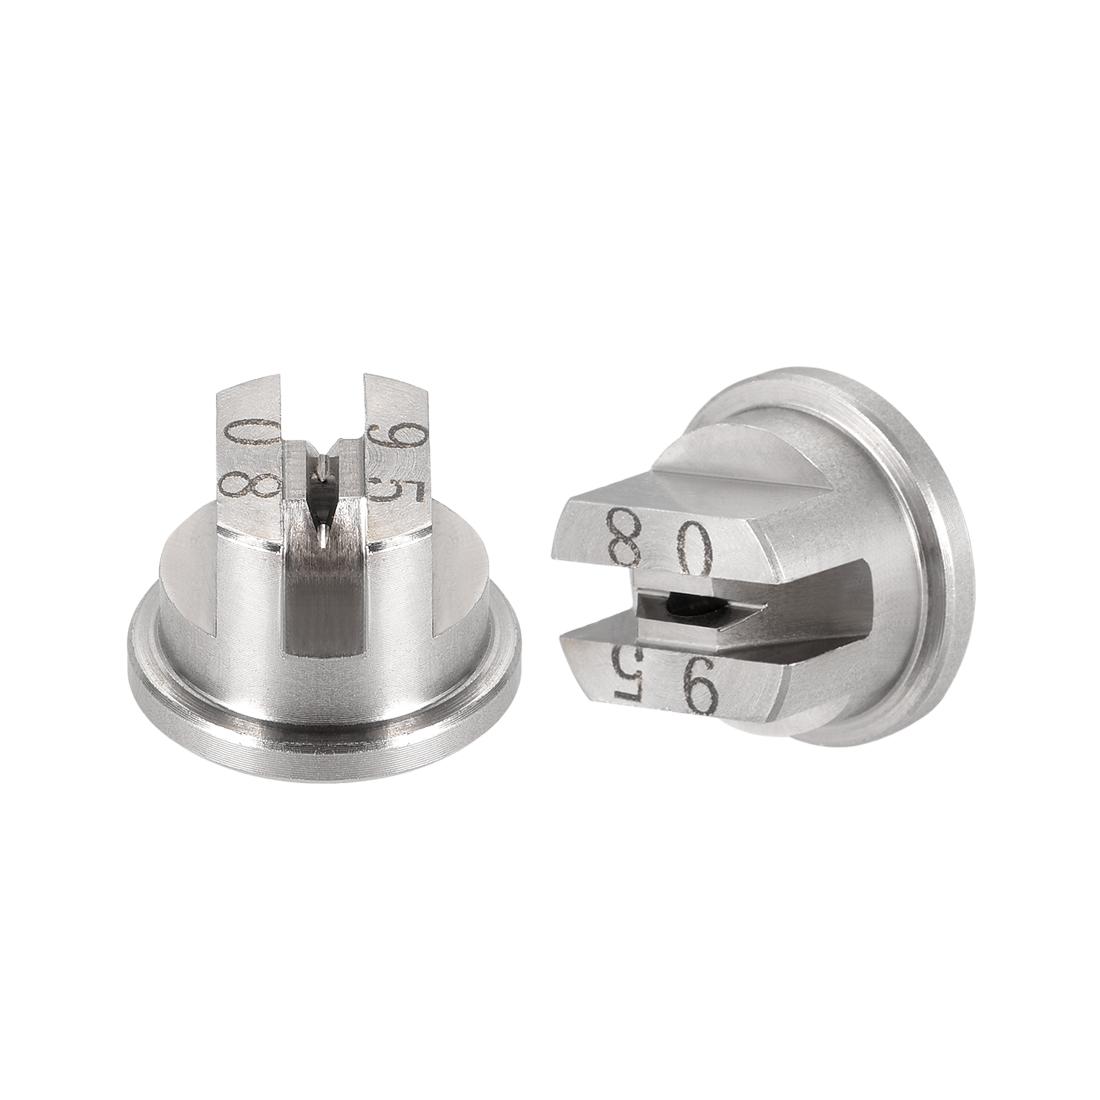 Flat Fan Spray Tip, 95 Degree Stainless Steel Nozzle, 2 Pcs (1.8mm Orifice Dia)